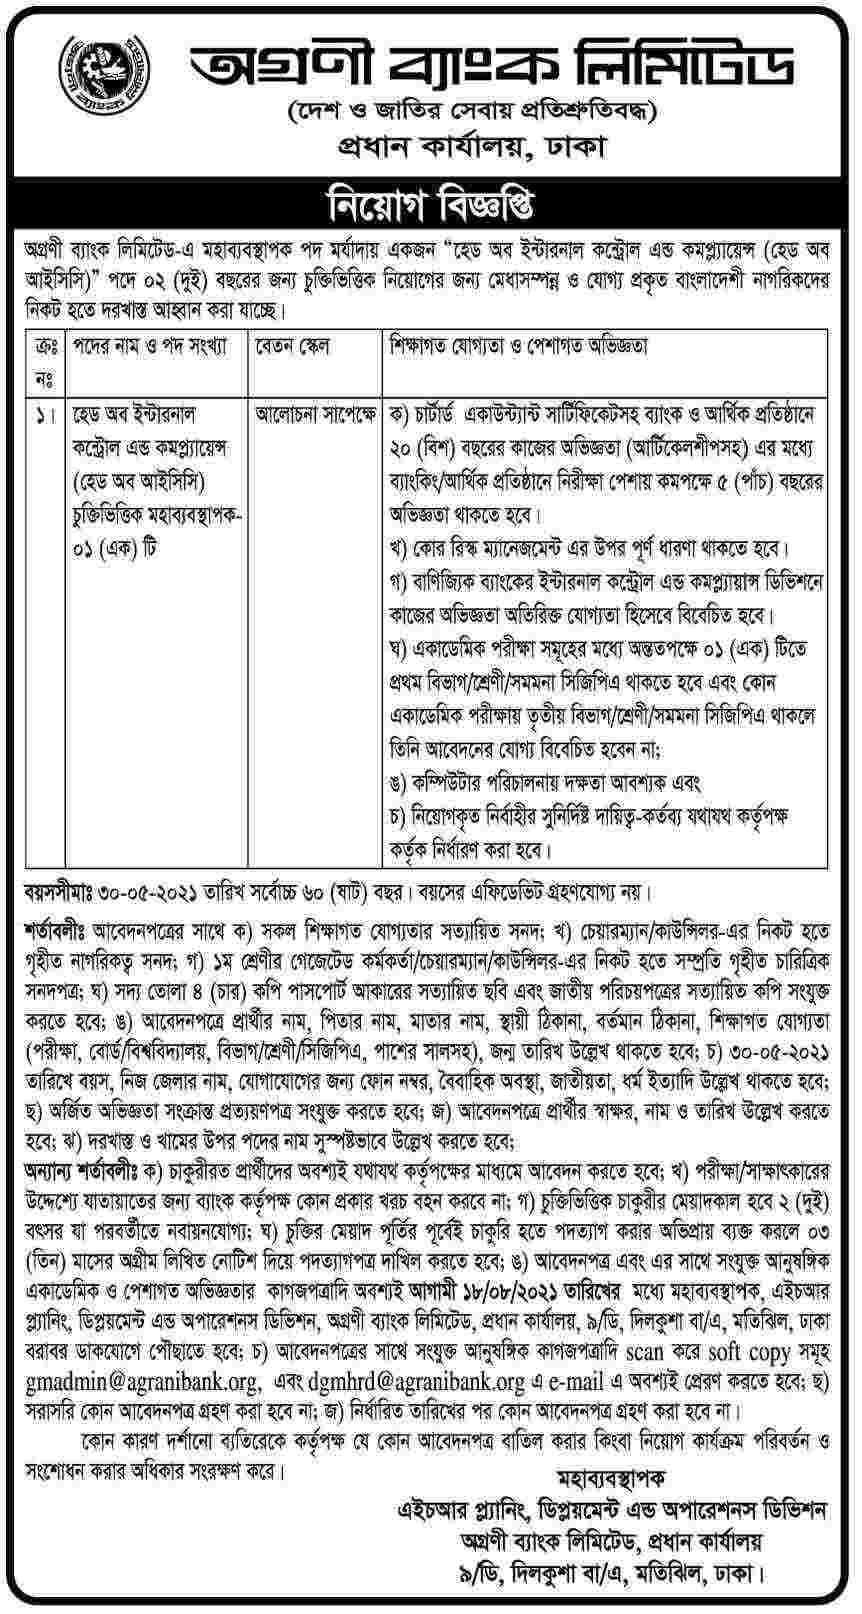 Agrani Bank Job Circular 2021